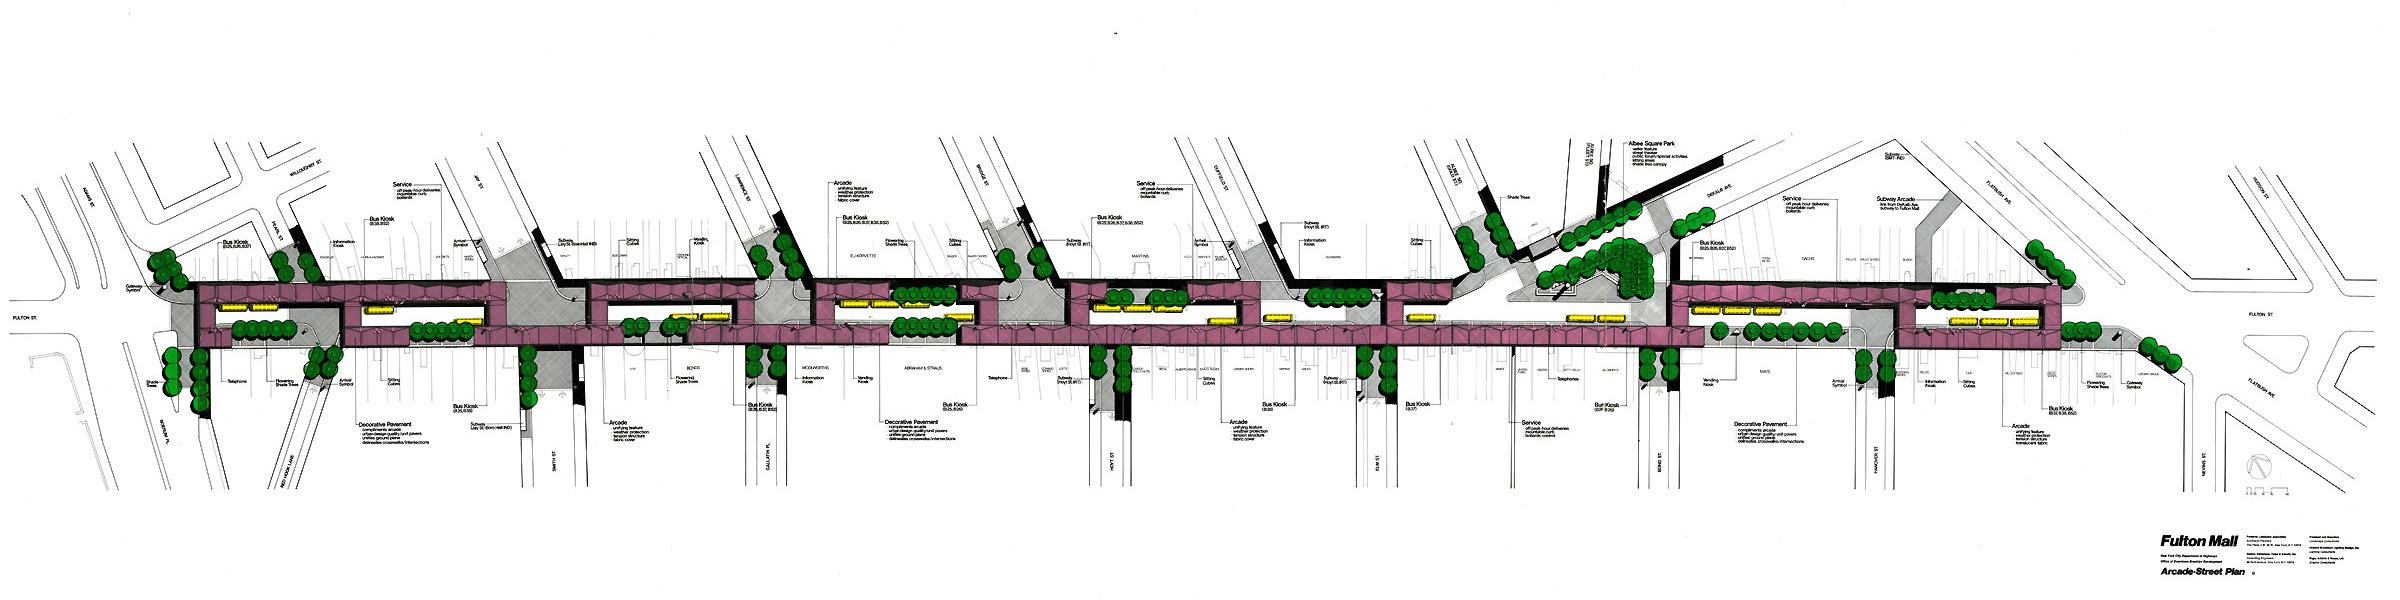 Fulton Street Mall Plan.jpg